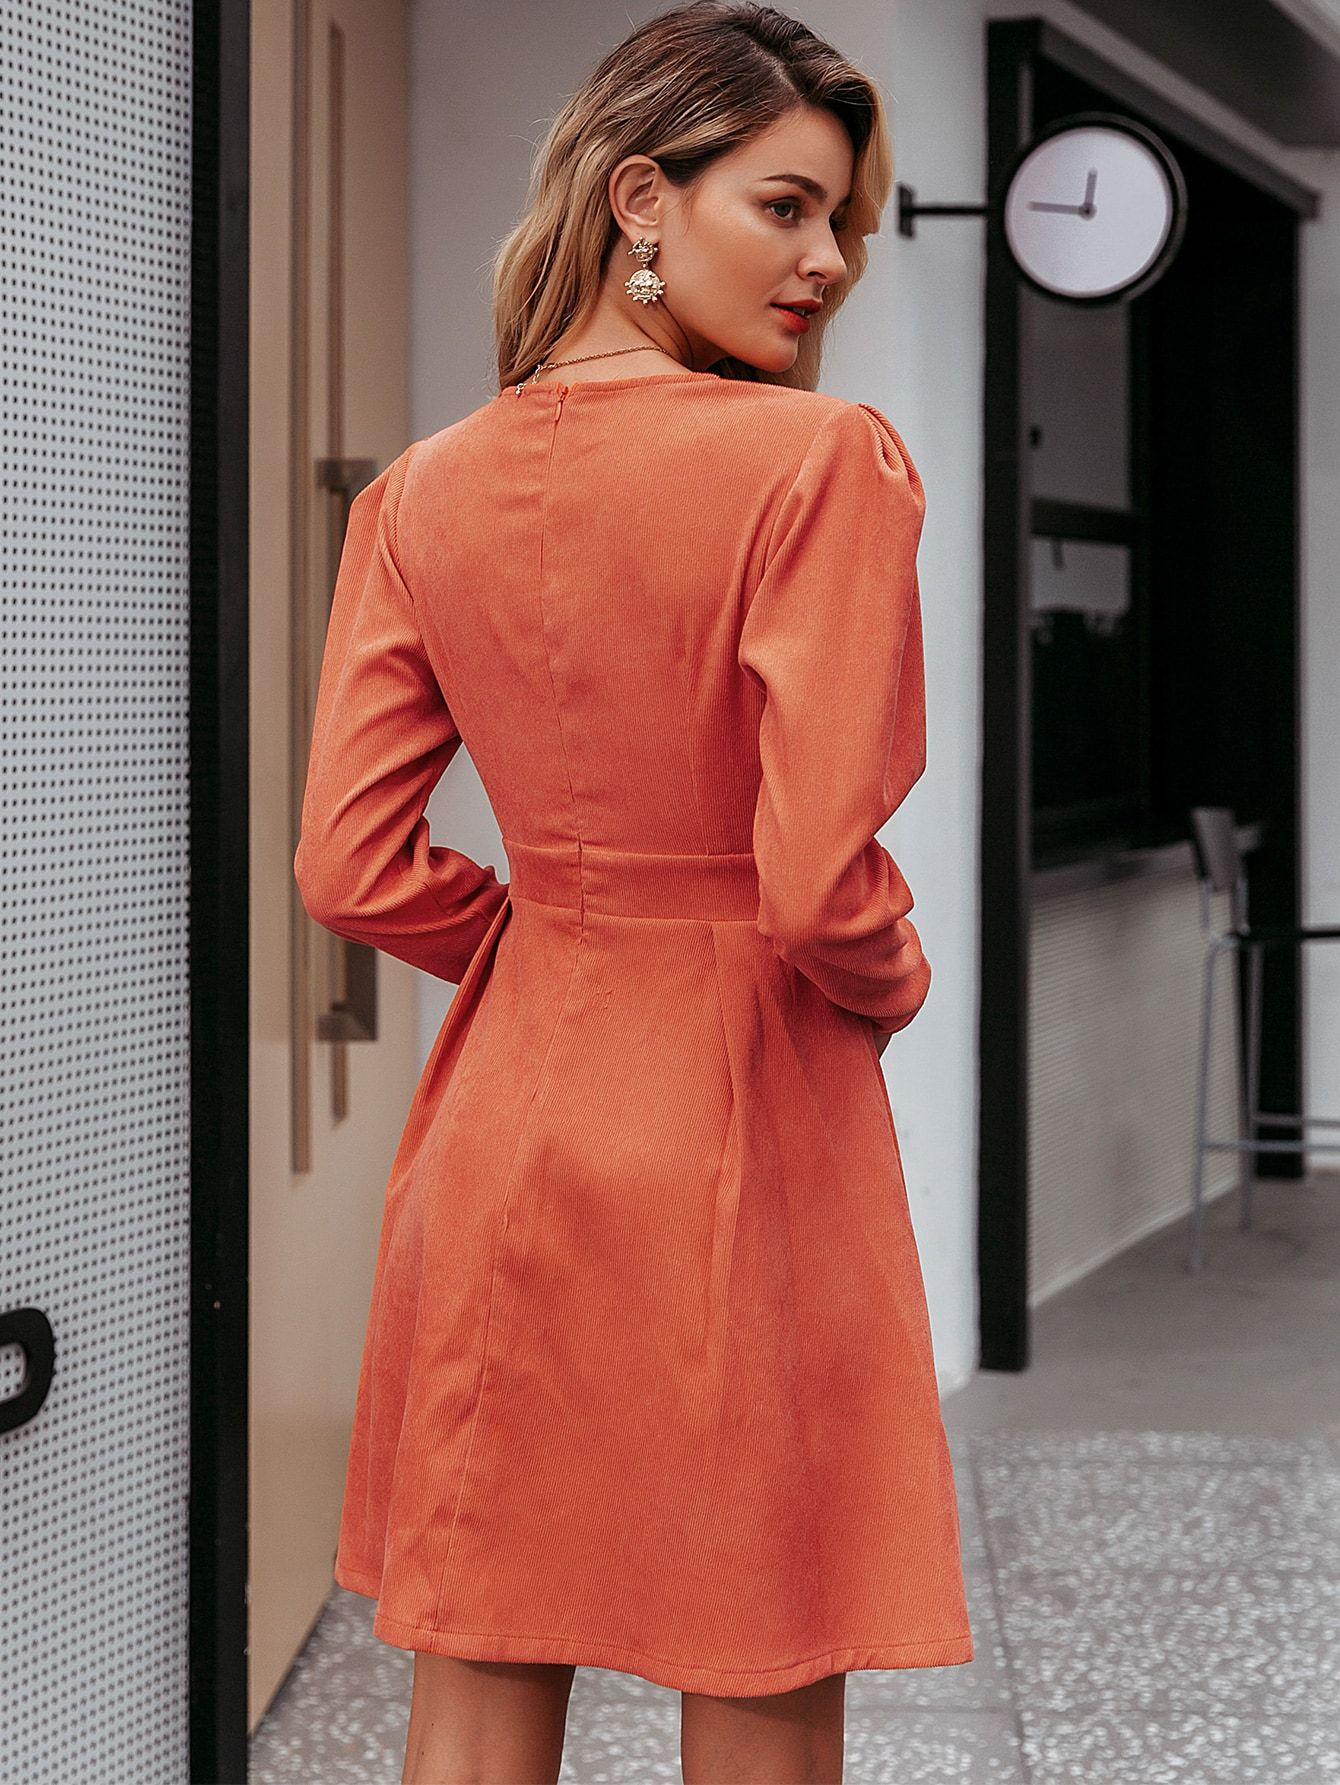 Simplee Gigot Sleeve Button Front Corduroy Dress Dress Sleeve Length Corduroy Dress Long Sleeve Tee Dress [ 1785 x 1340 Pixel ]